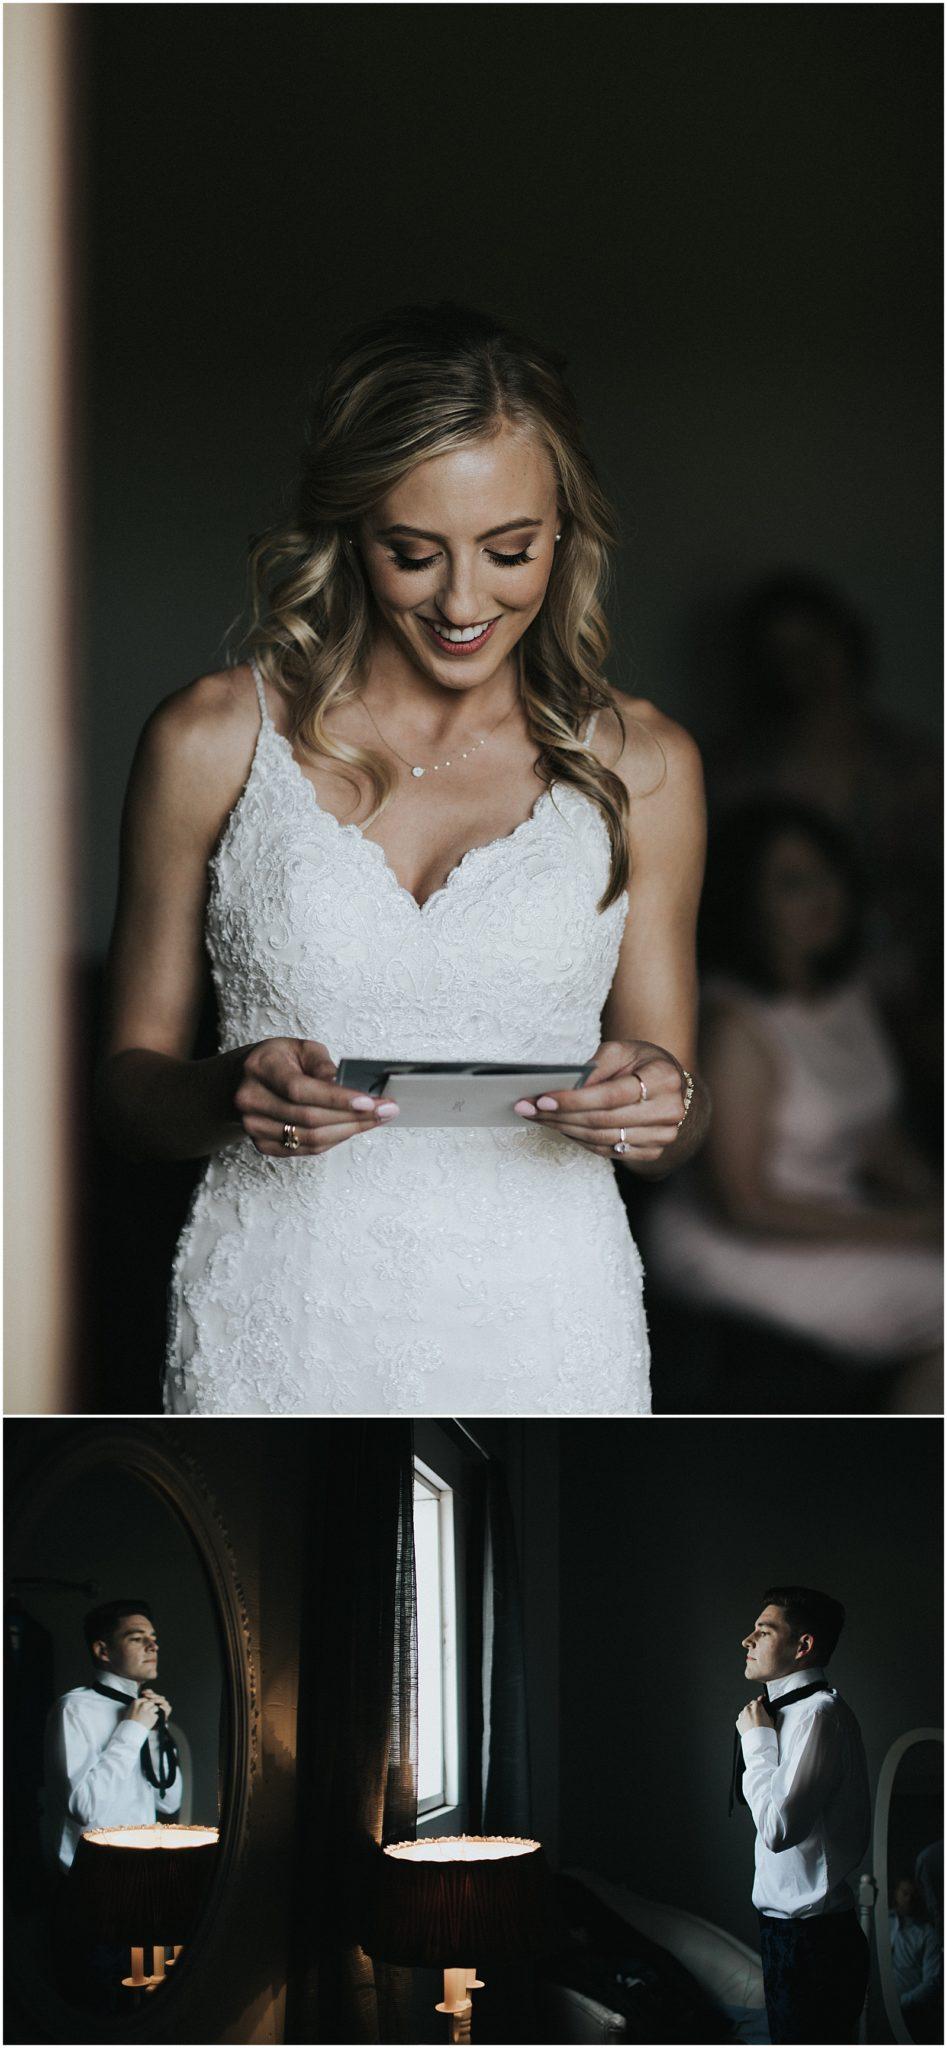 caitlin-dillon-getting-ready-hers-sullivan-and-sullivan (19 of 37)_seattle wedding.jpg